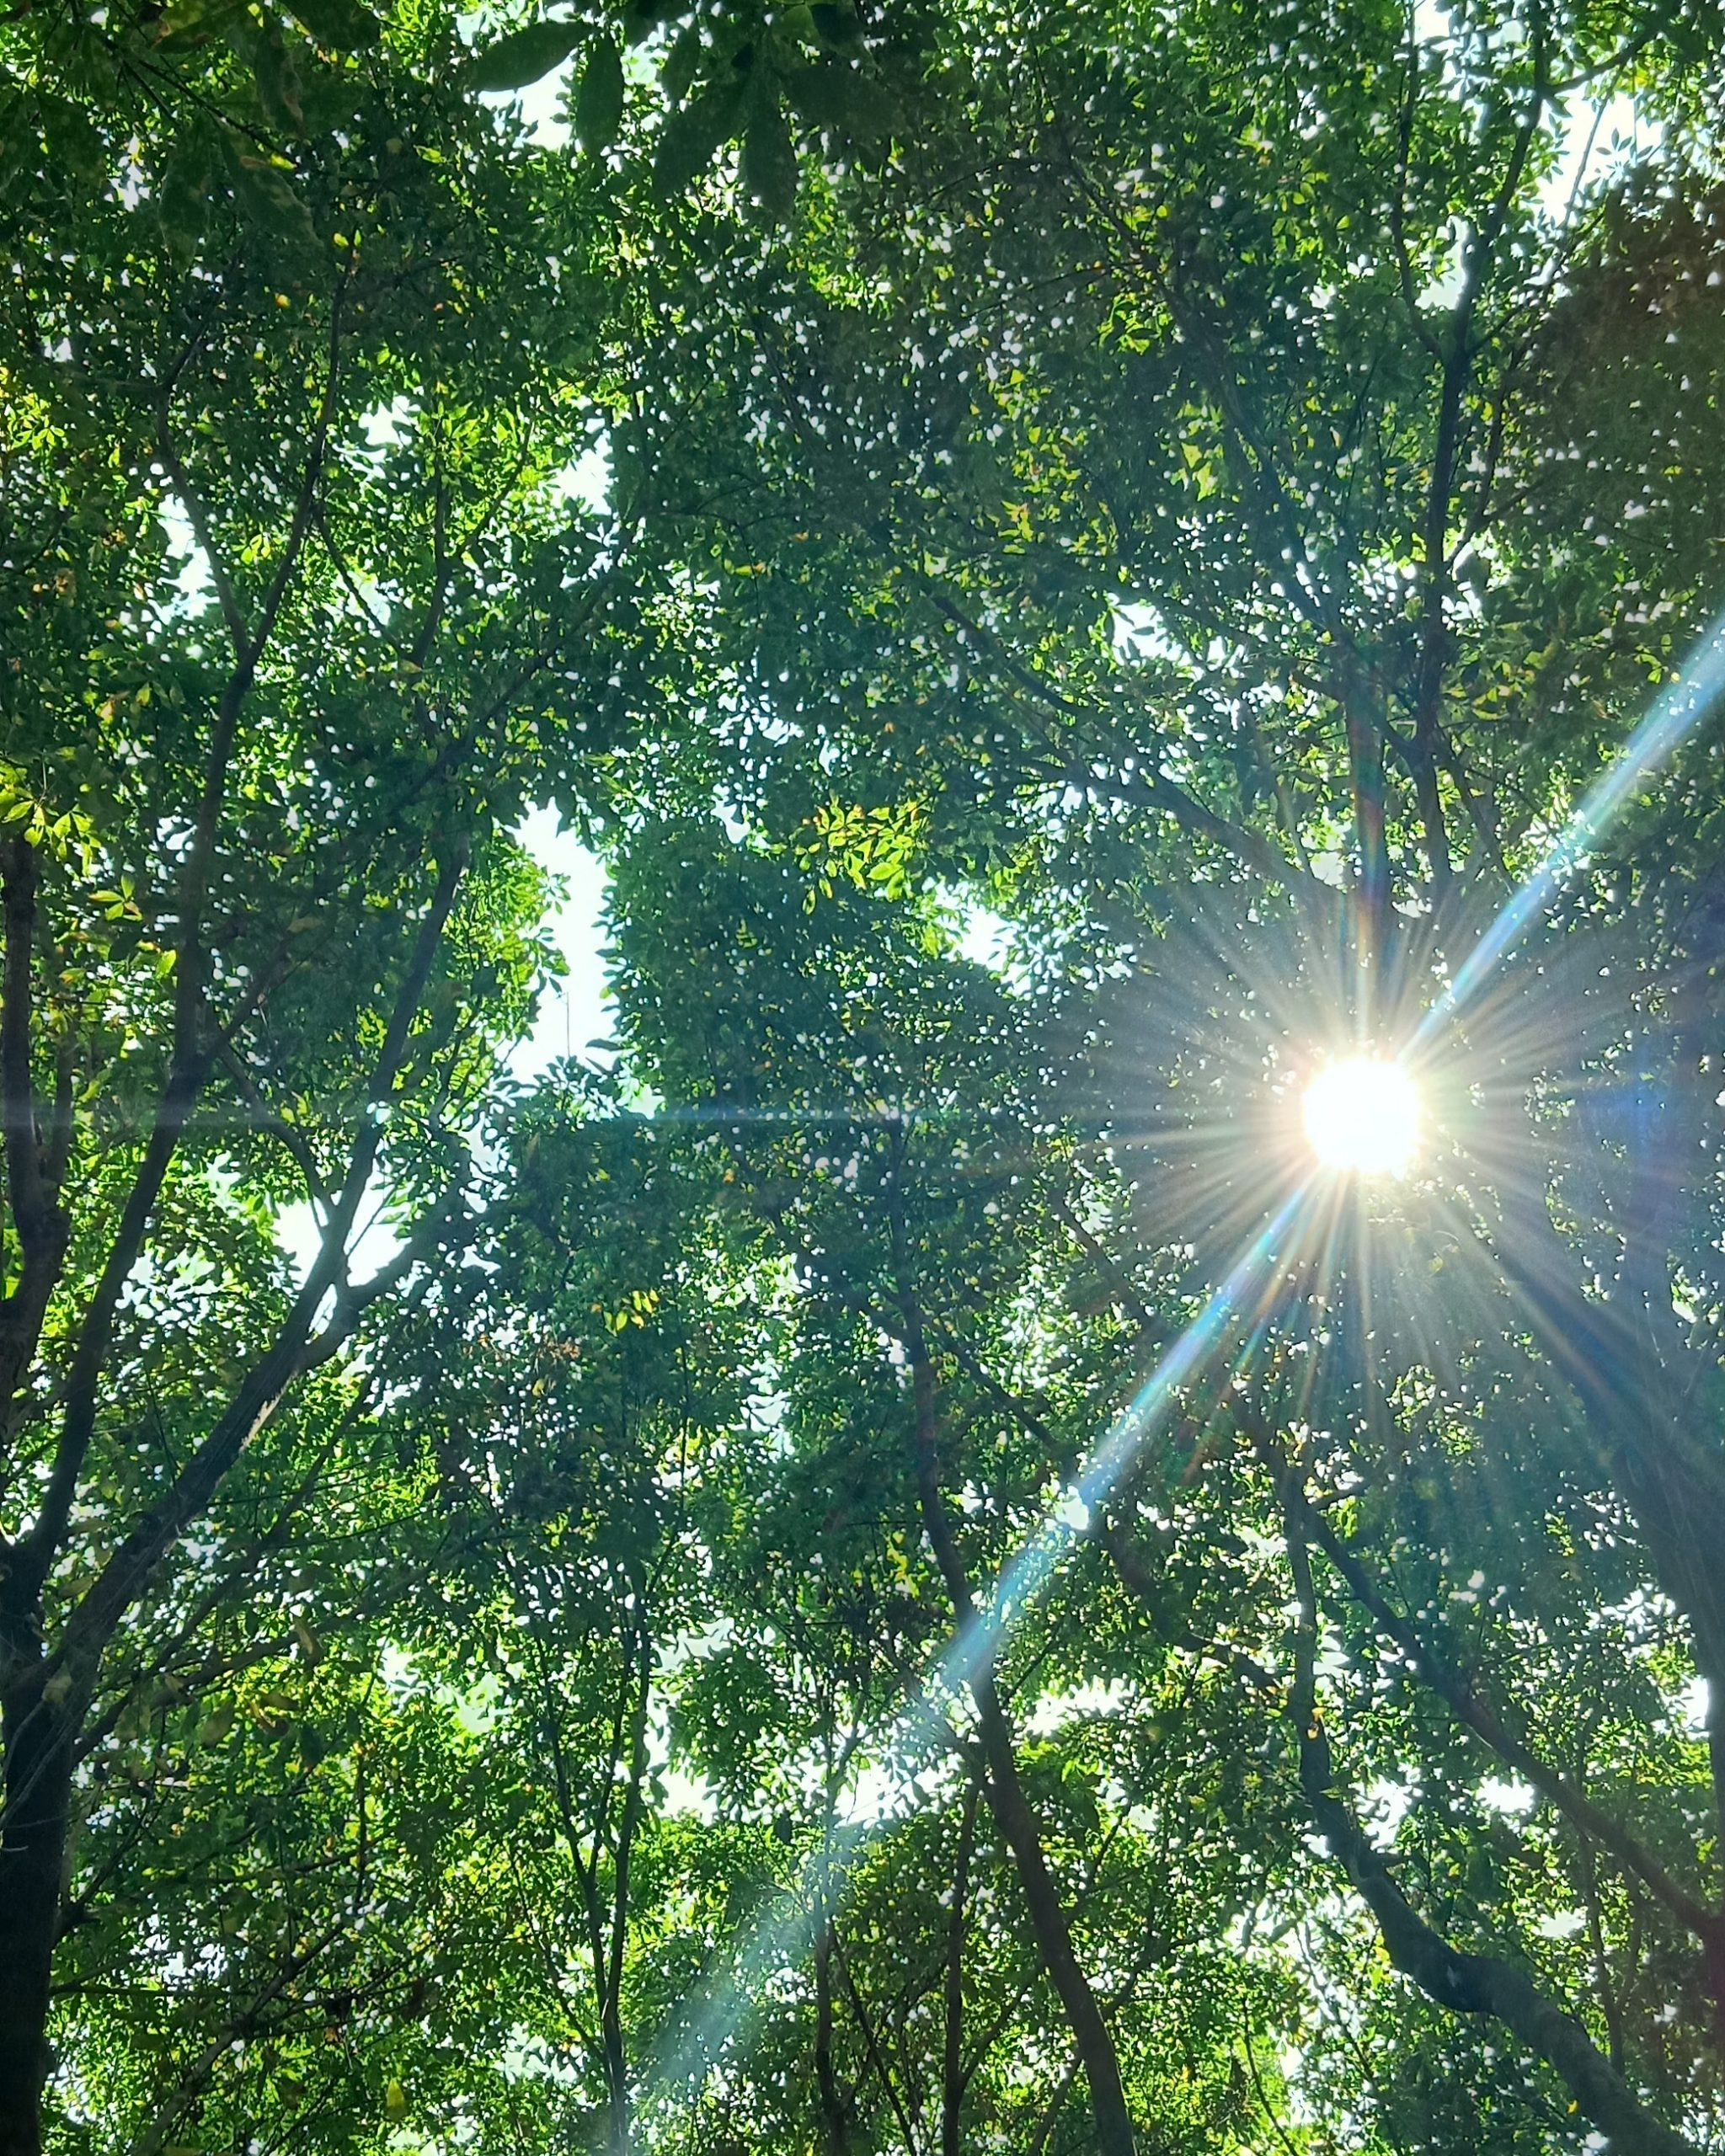 sun shining behind leaves